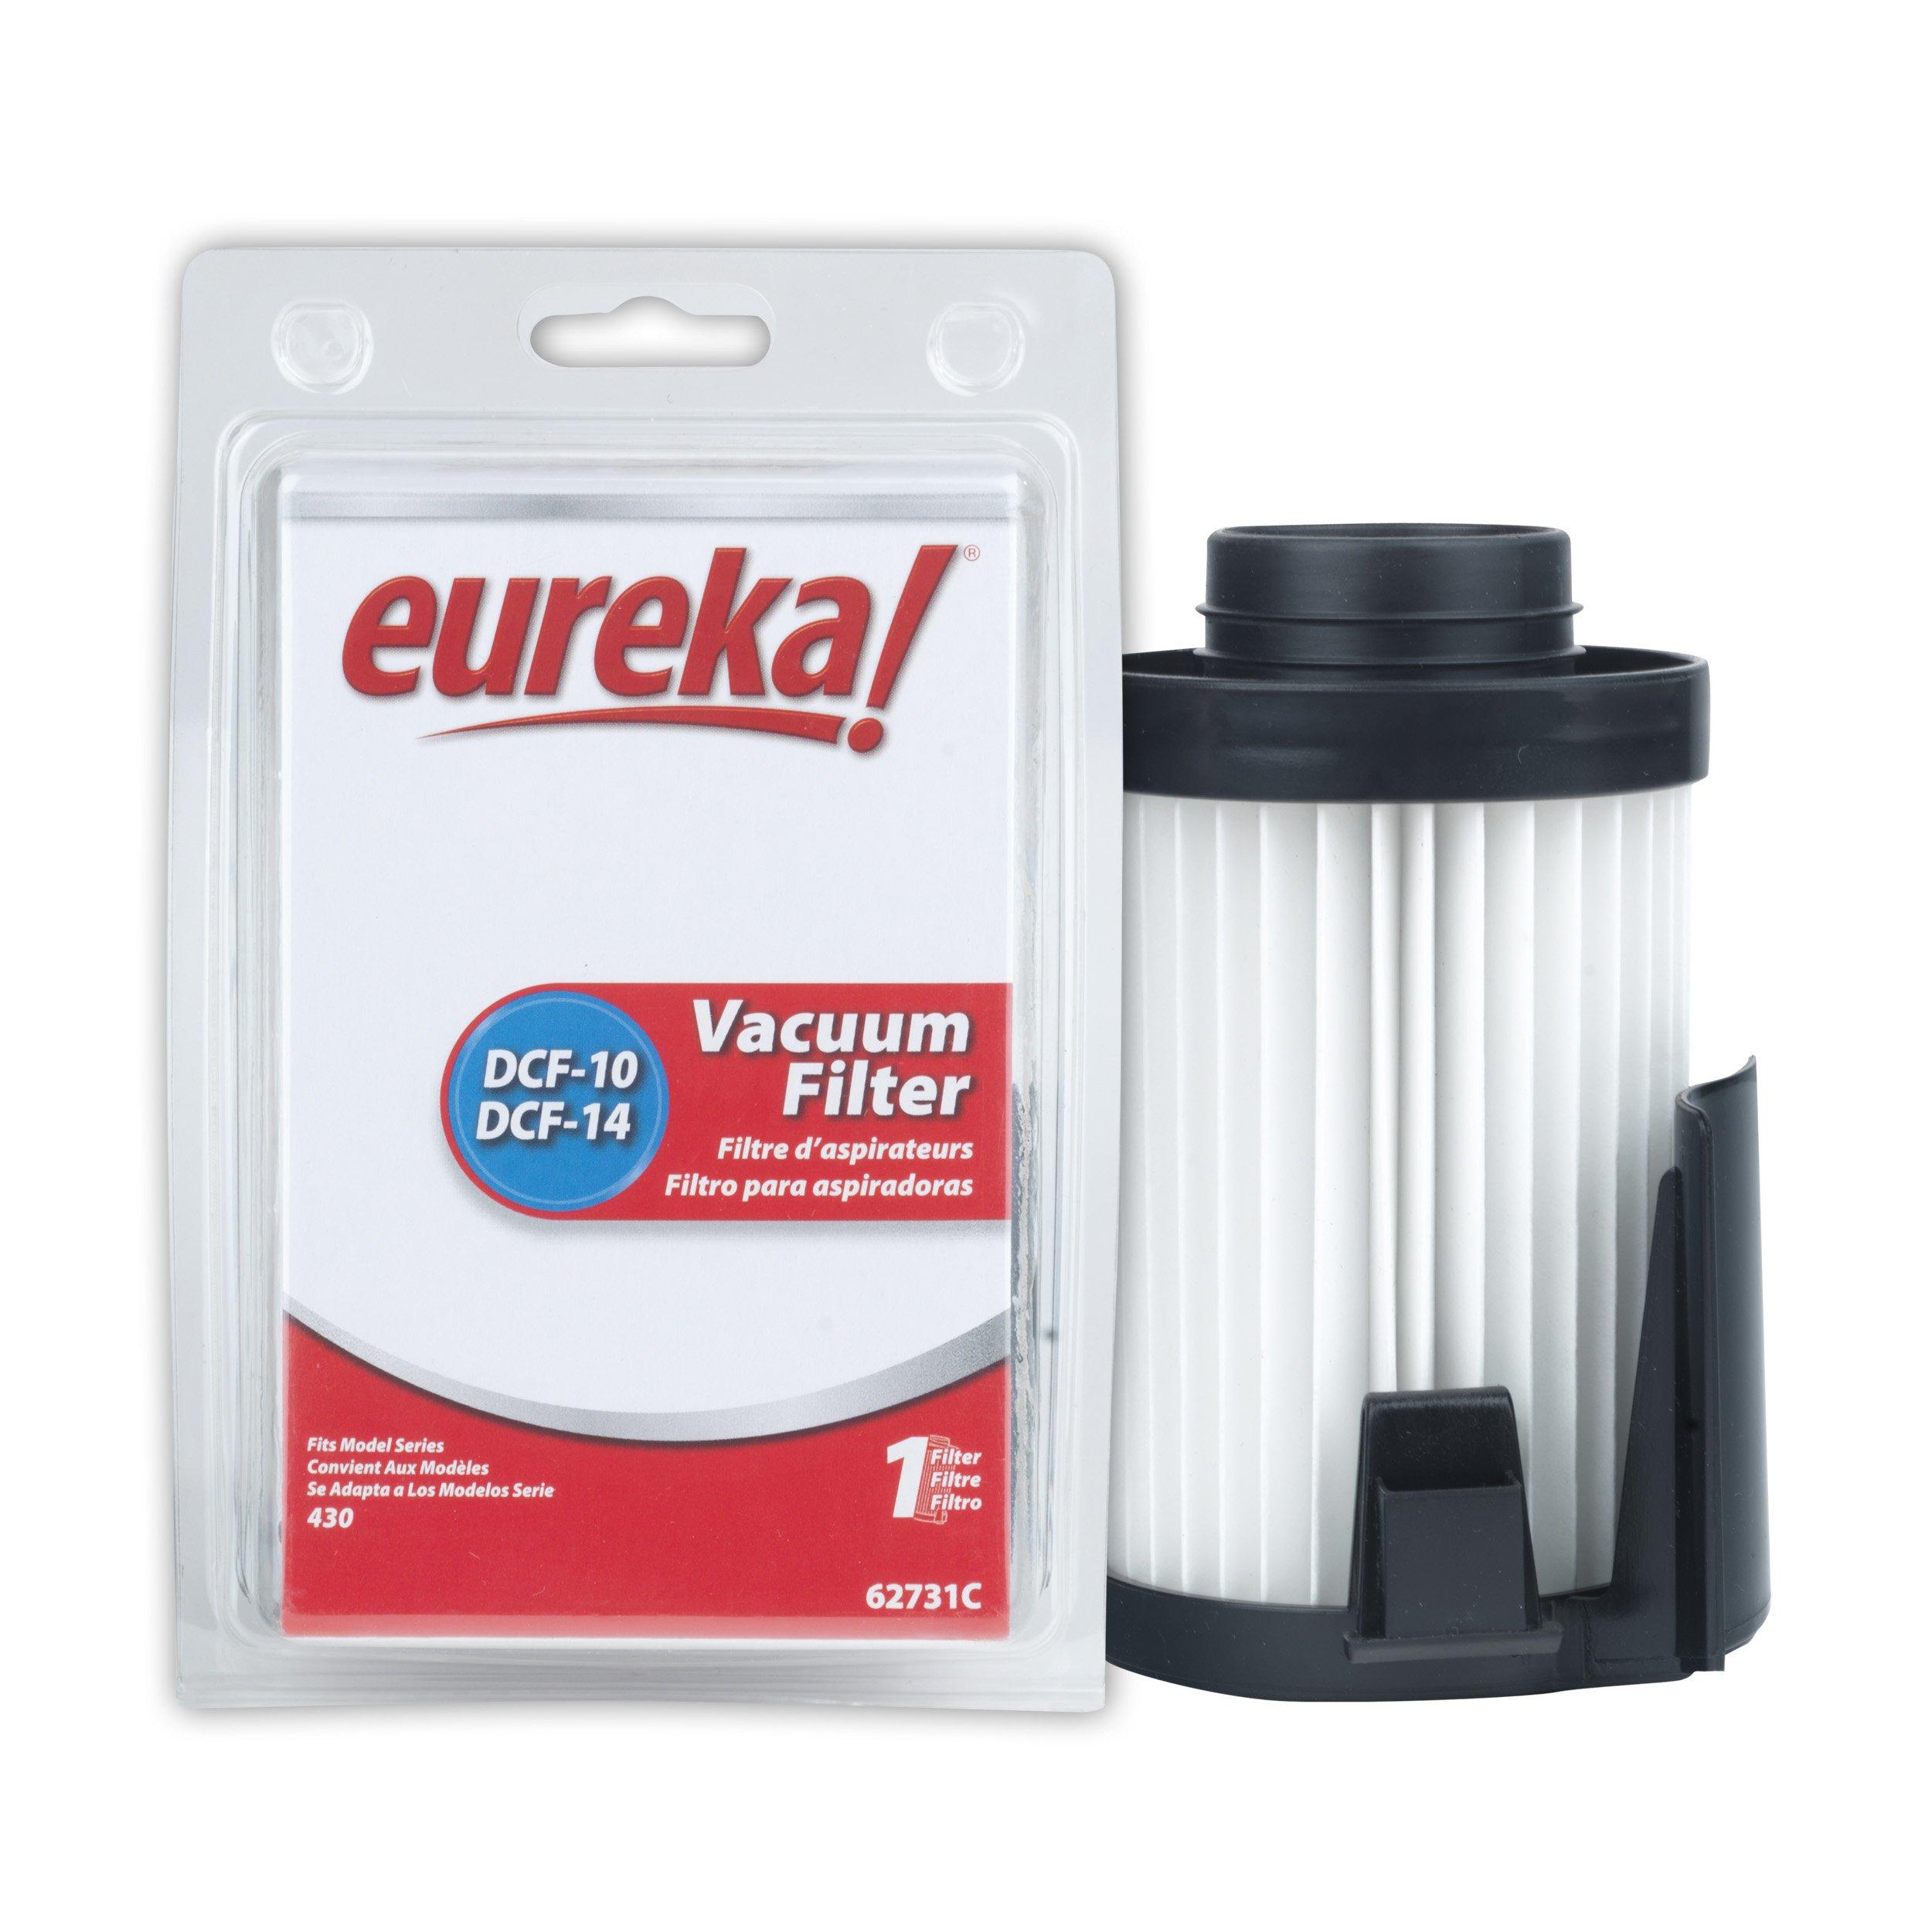 Eureka Genuine DCF-10 / DCF-14 HEPA Filter 62731C - 1 filter